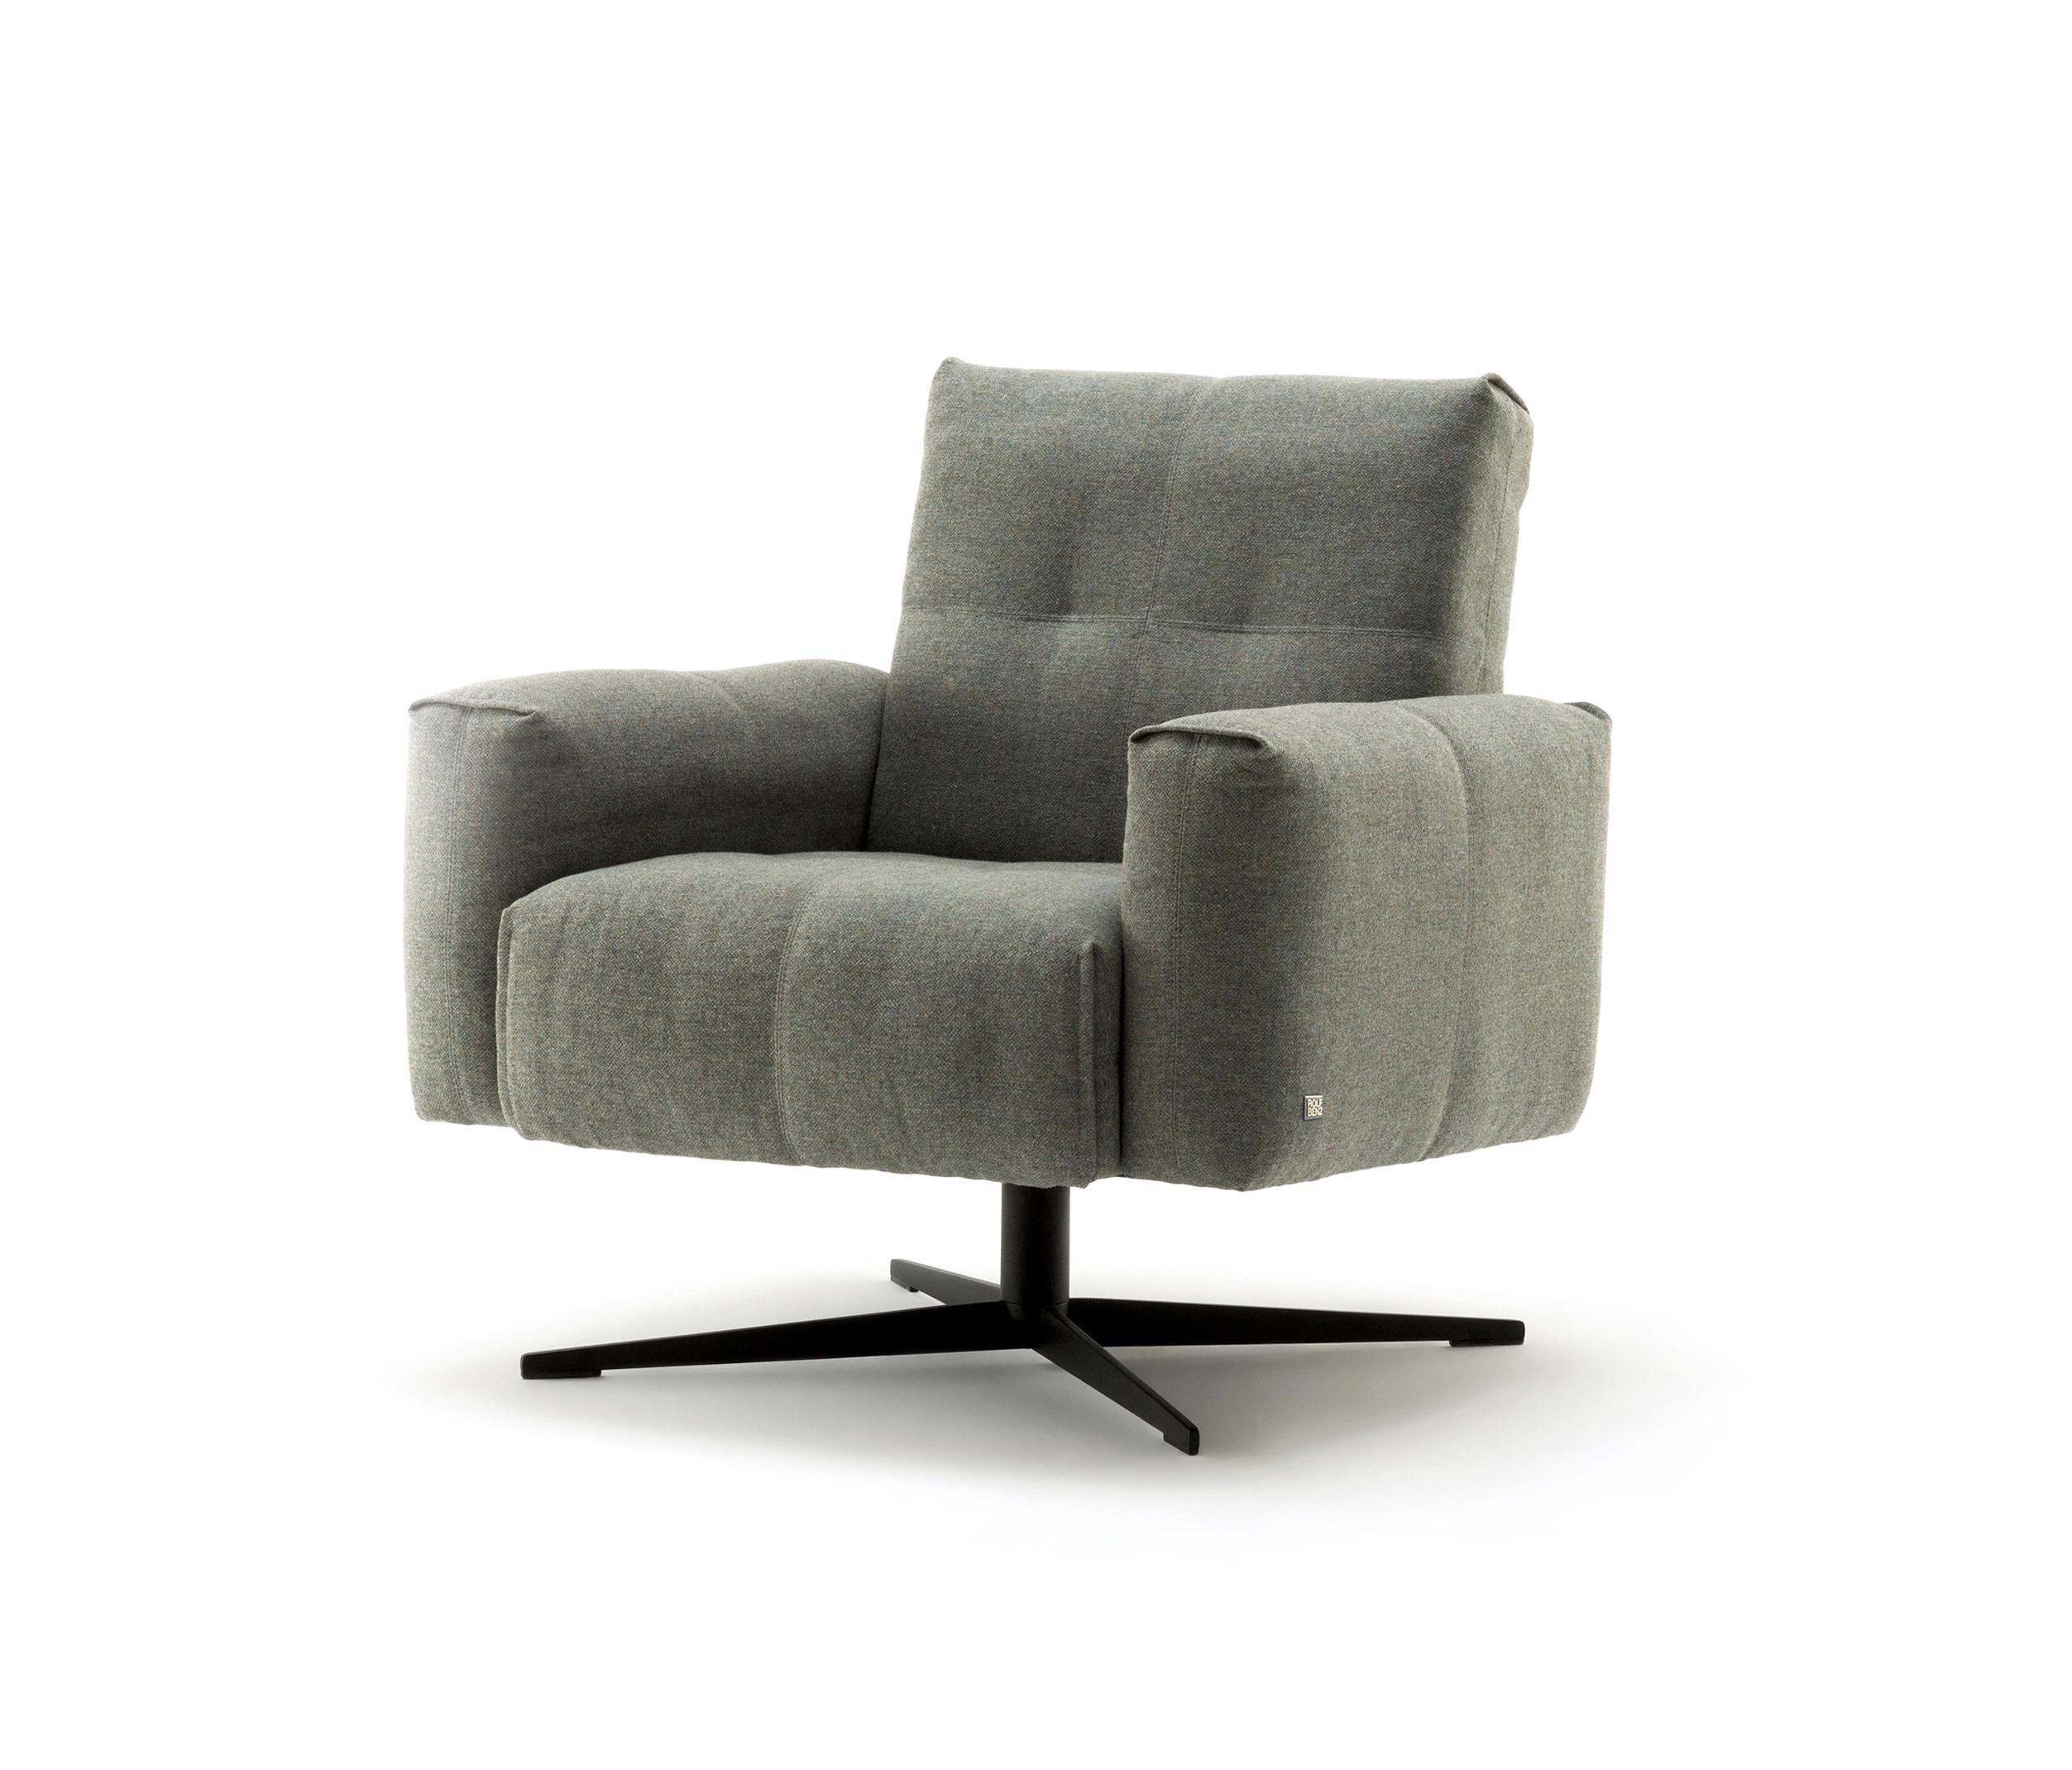 rolf benz 50 se sillones de rolf benz architonic. Black Bedroom Furniture Sets. Home Design Ideas